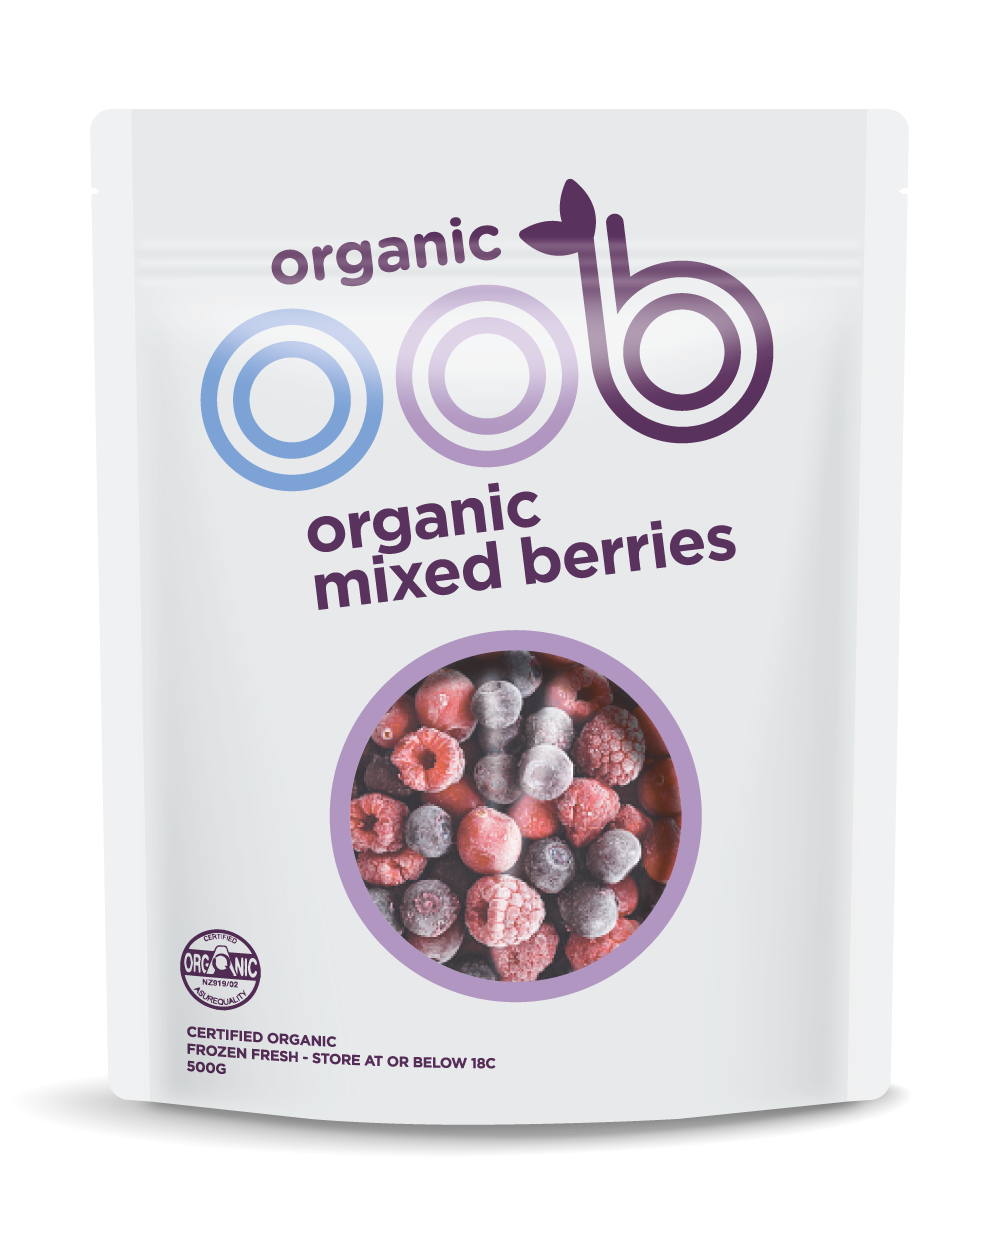 33845-OOB-Single-Fruit-Range-Mixed-Berries-Mockup.png